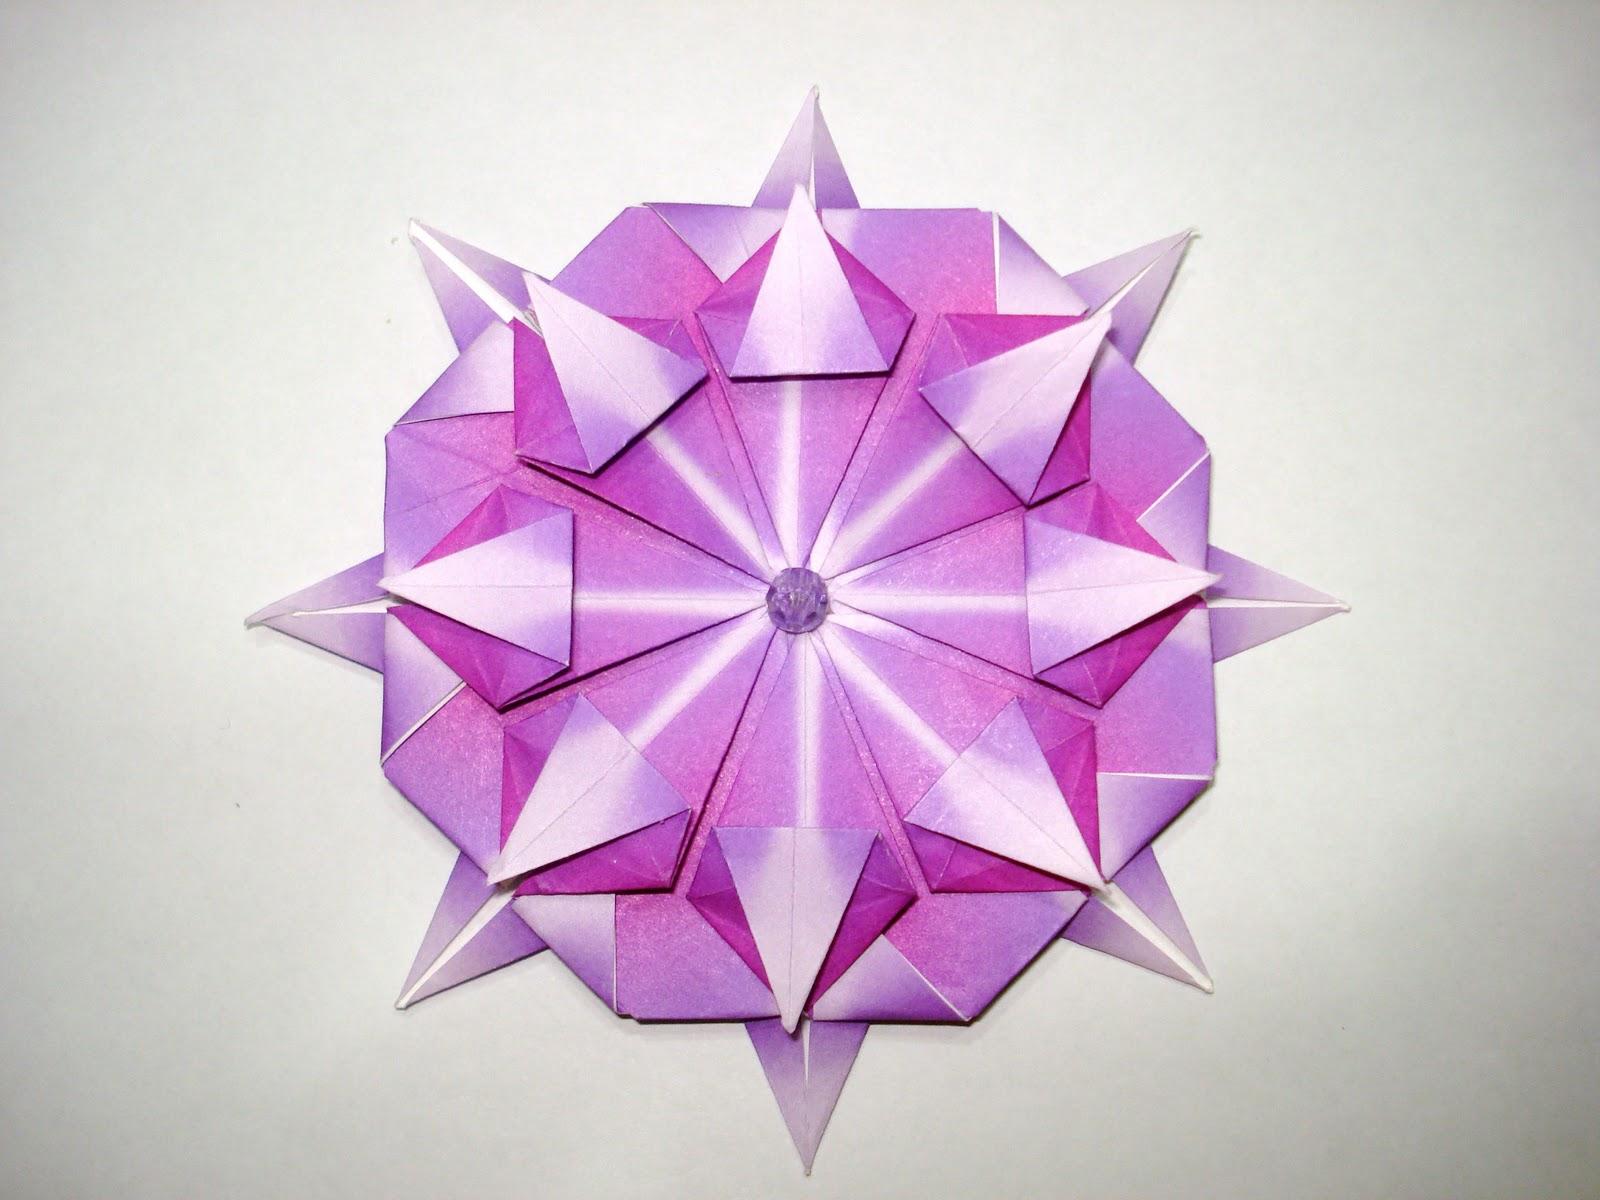 Origami compass rose